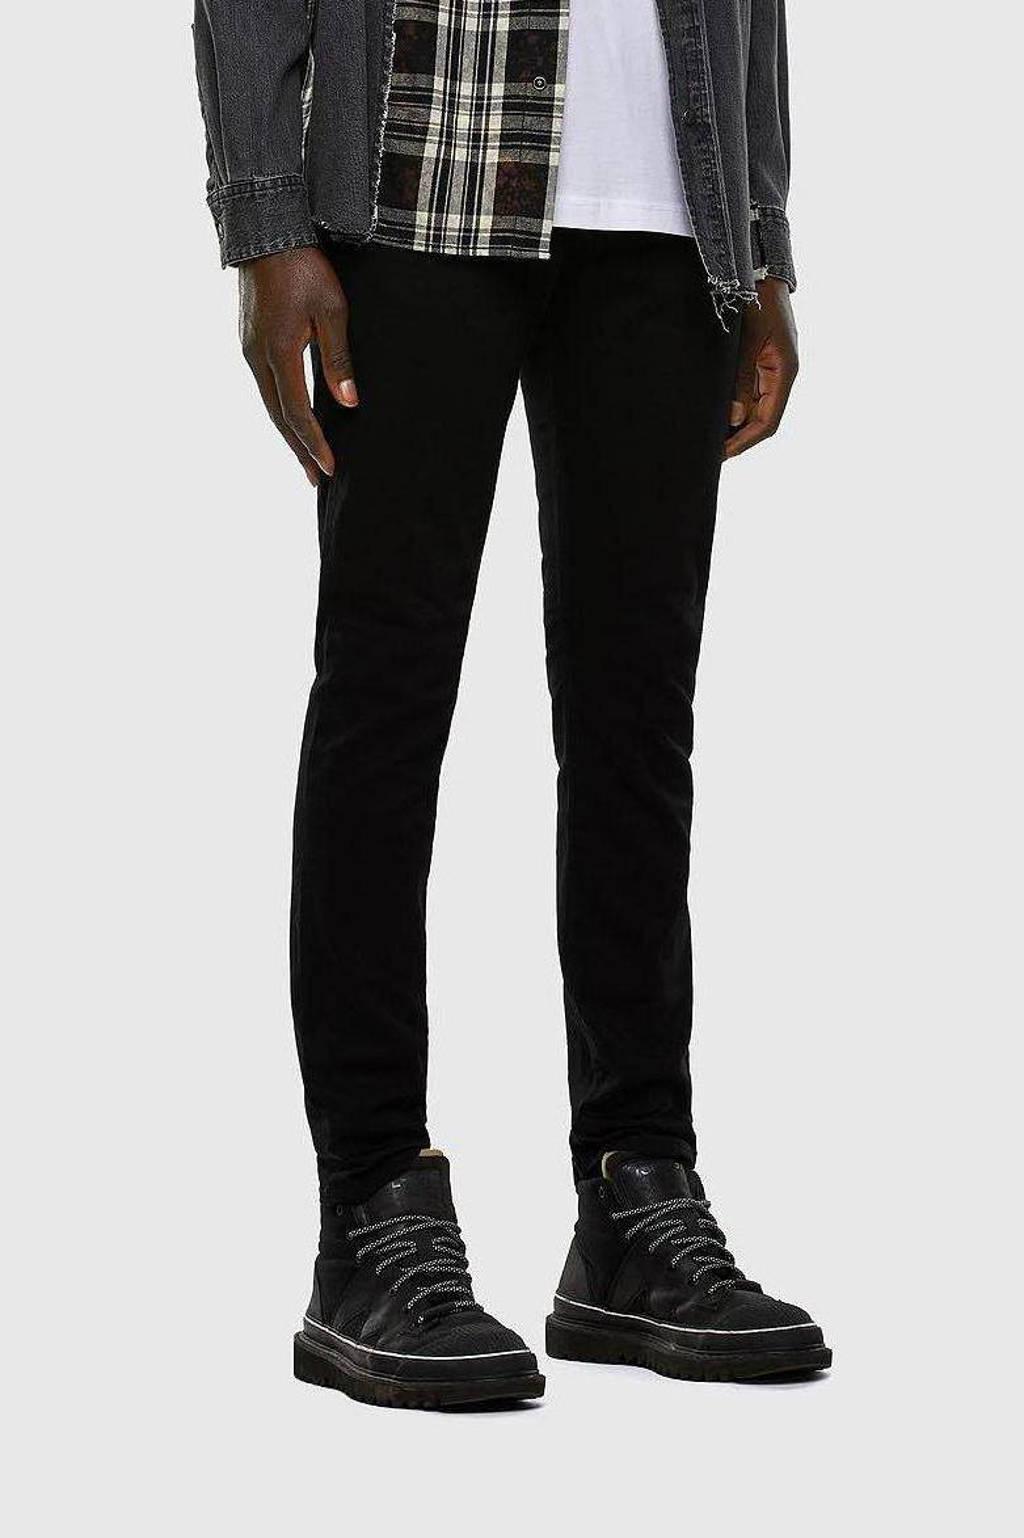 Diesel slim fit jeans D-Strukt 02 / Black, 02/Black